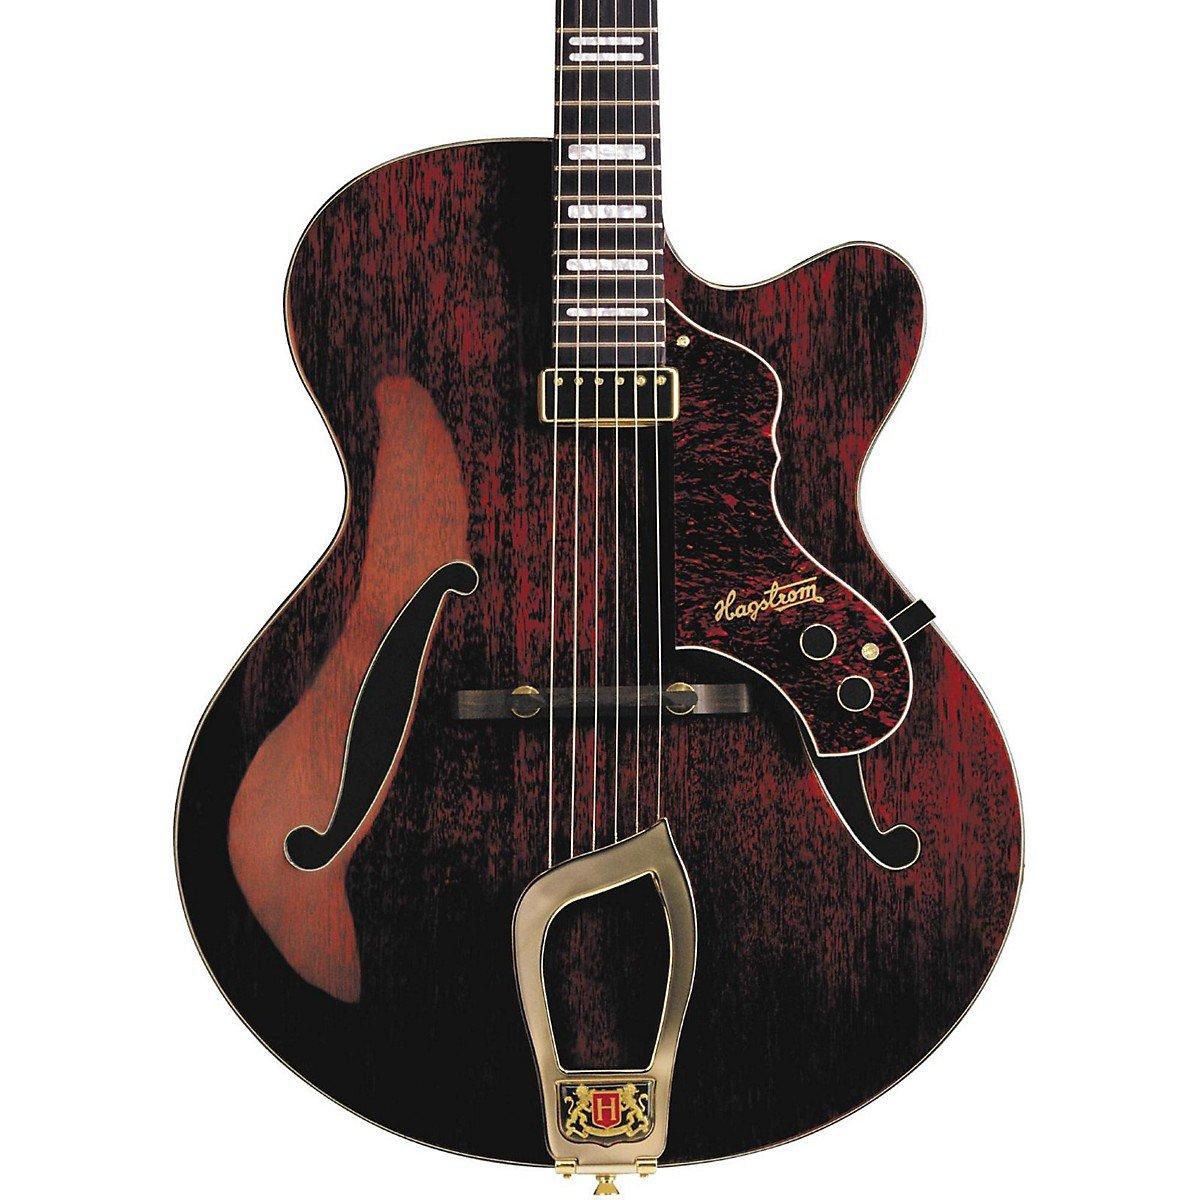 Cheap Hagstrom Jazz Model Hl-550 Hollowbody Electric Guitar Gloss Natural Mahogany Black Friday & Cyber Monday 2019